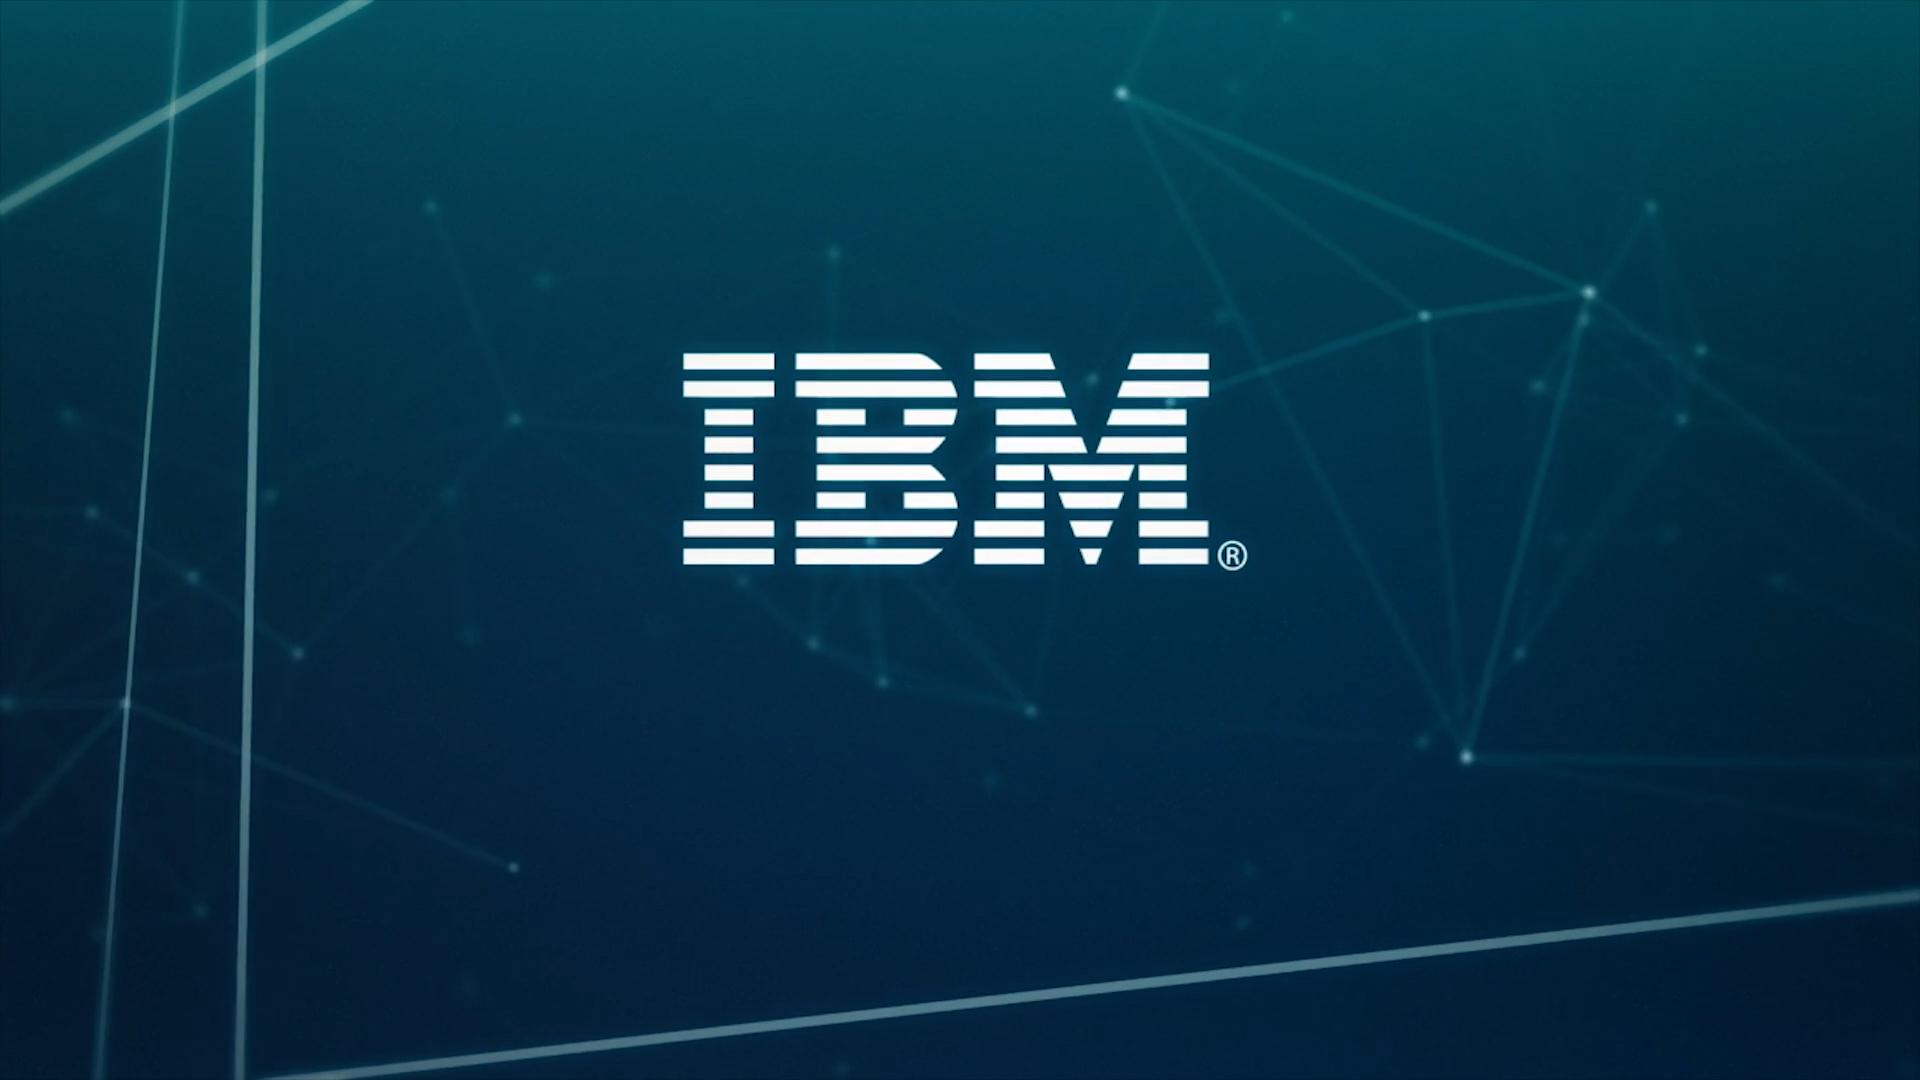 NICESHOES_IBM_BIGDATA285945634 (0-01-42-19).jpg